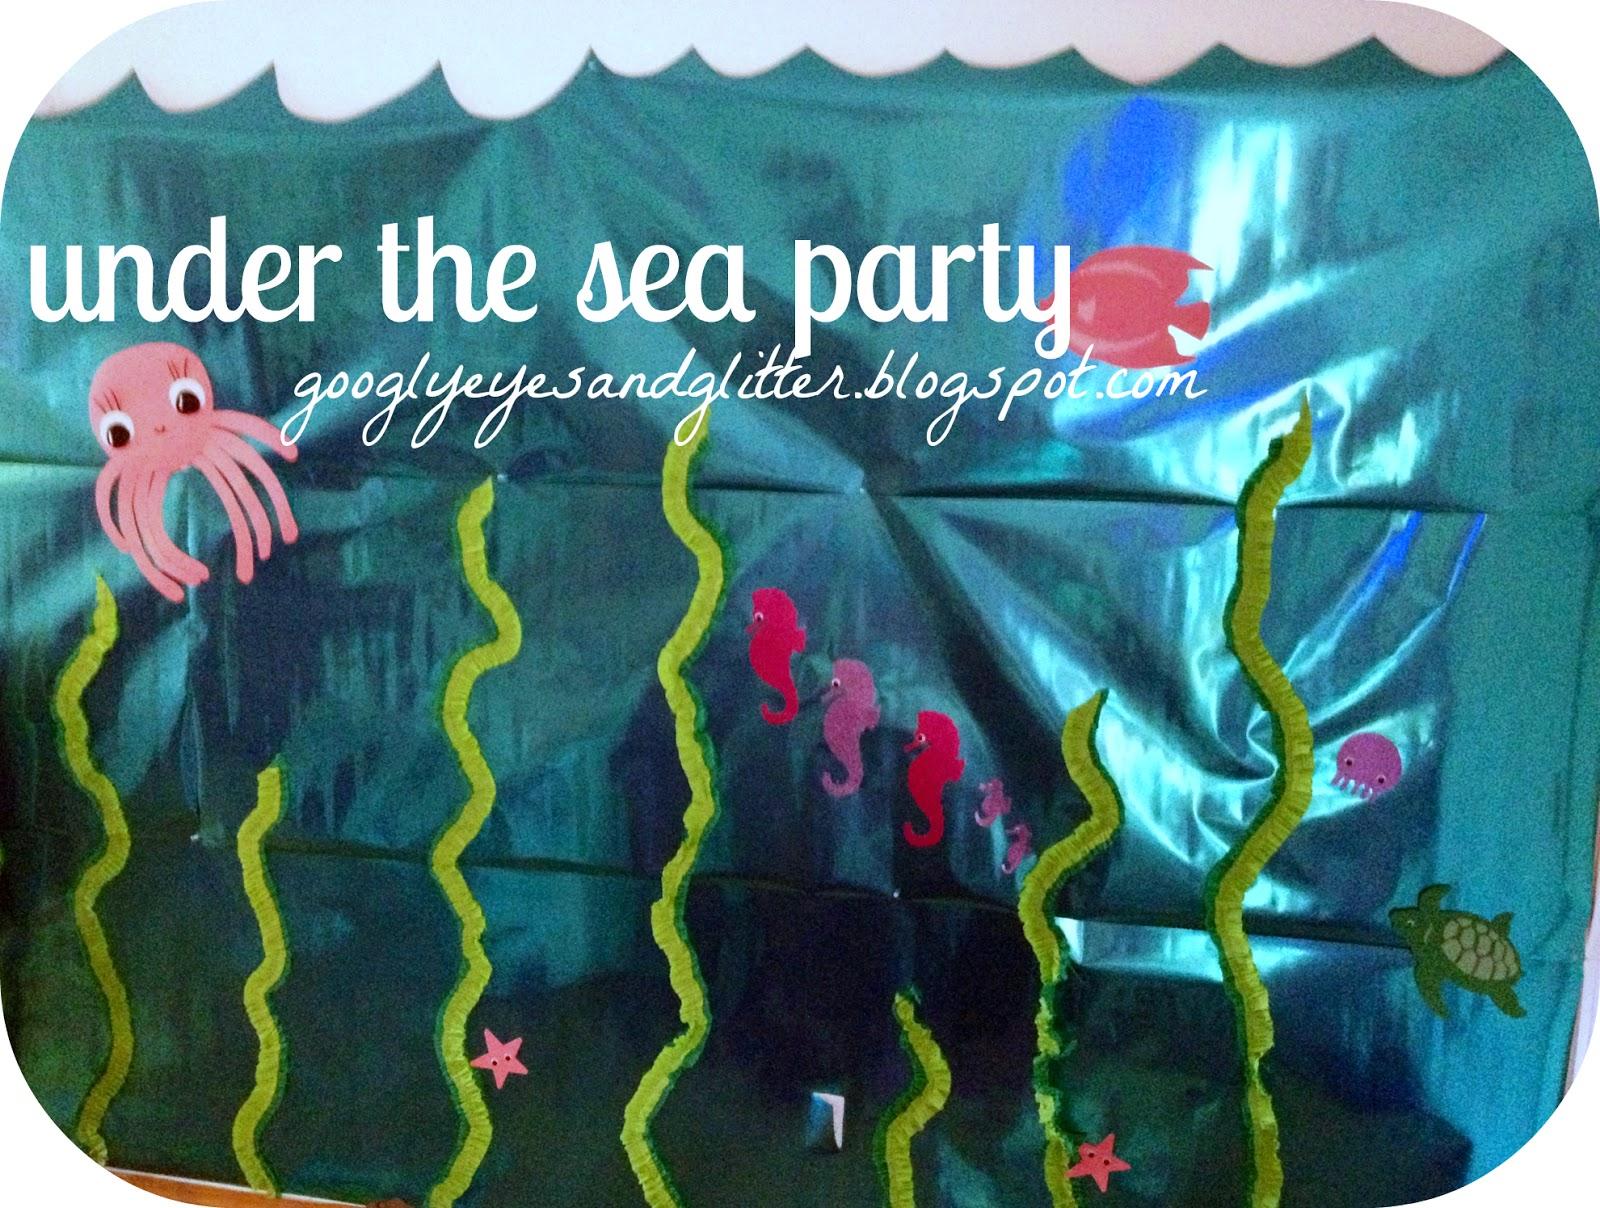 Googly eyes amp glitter under the sea mermaid themed birthday party